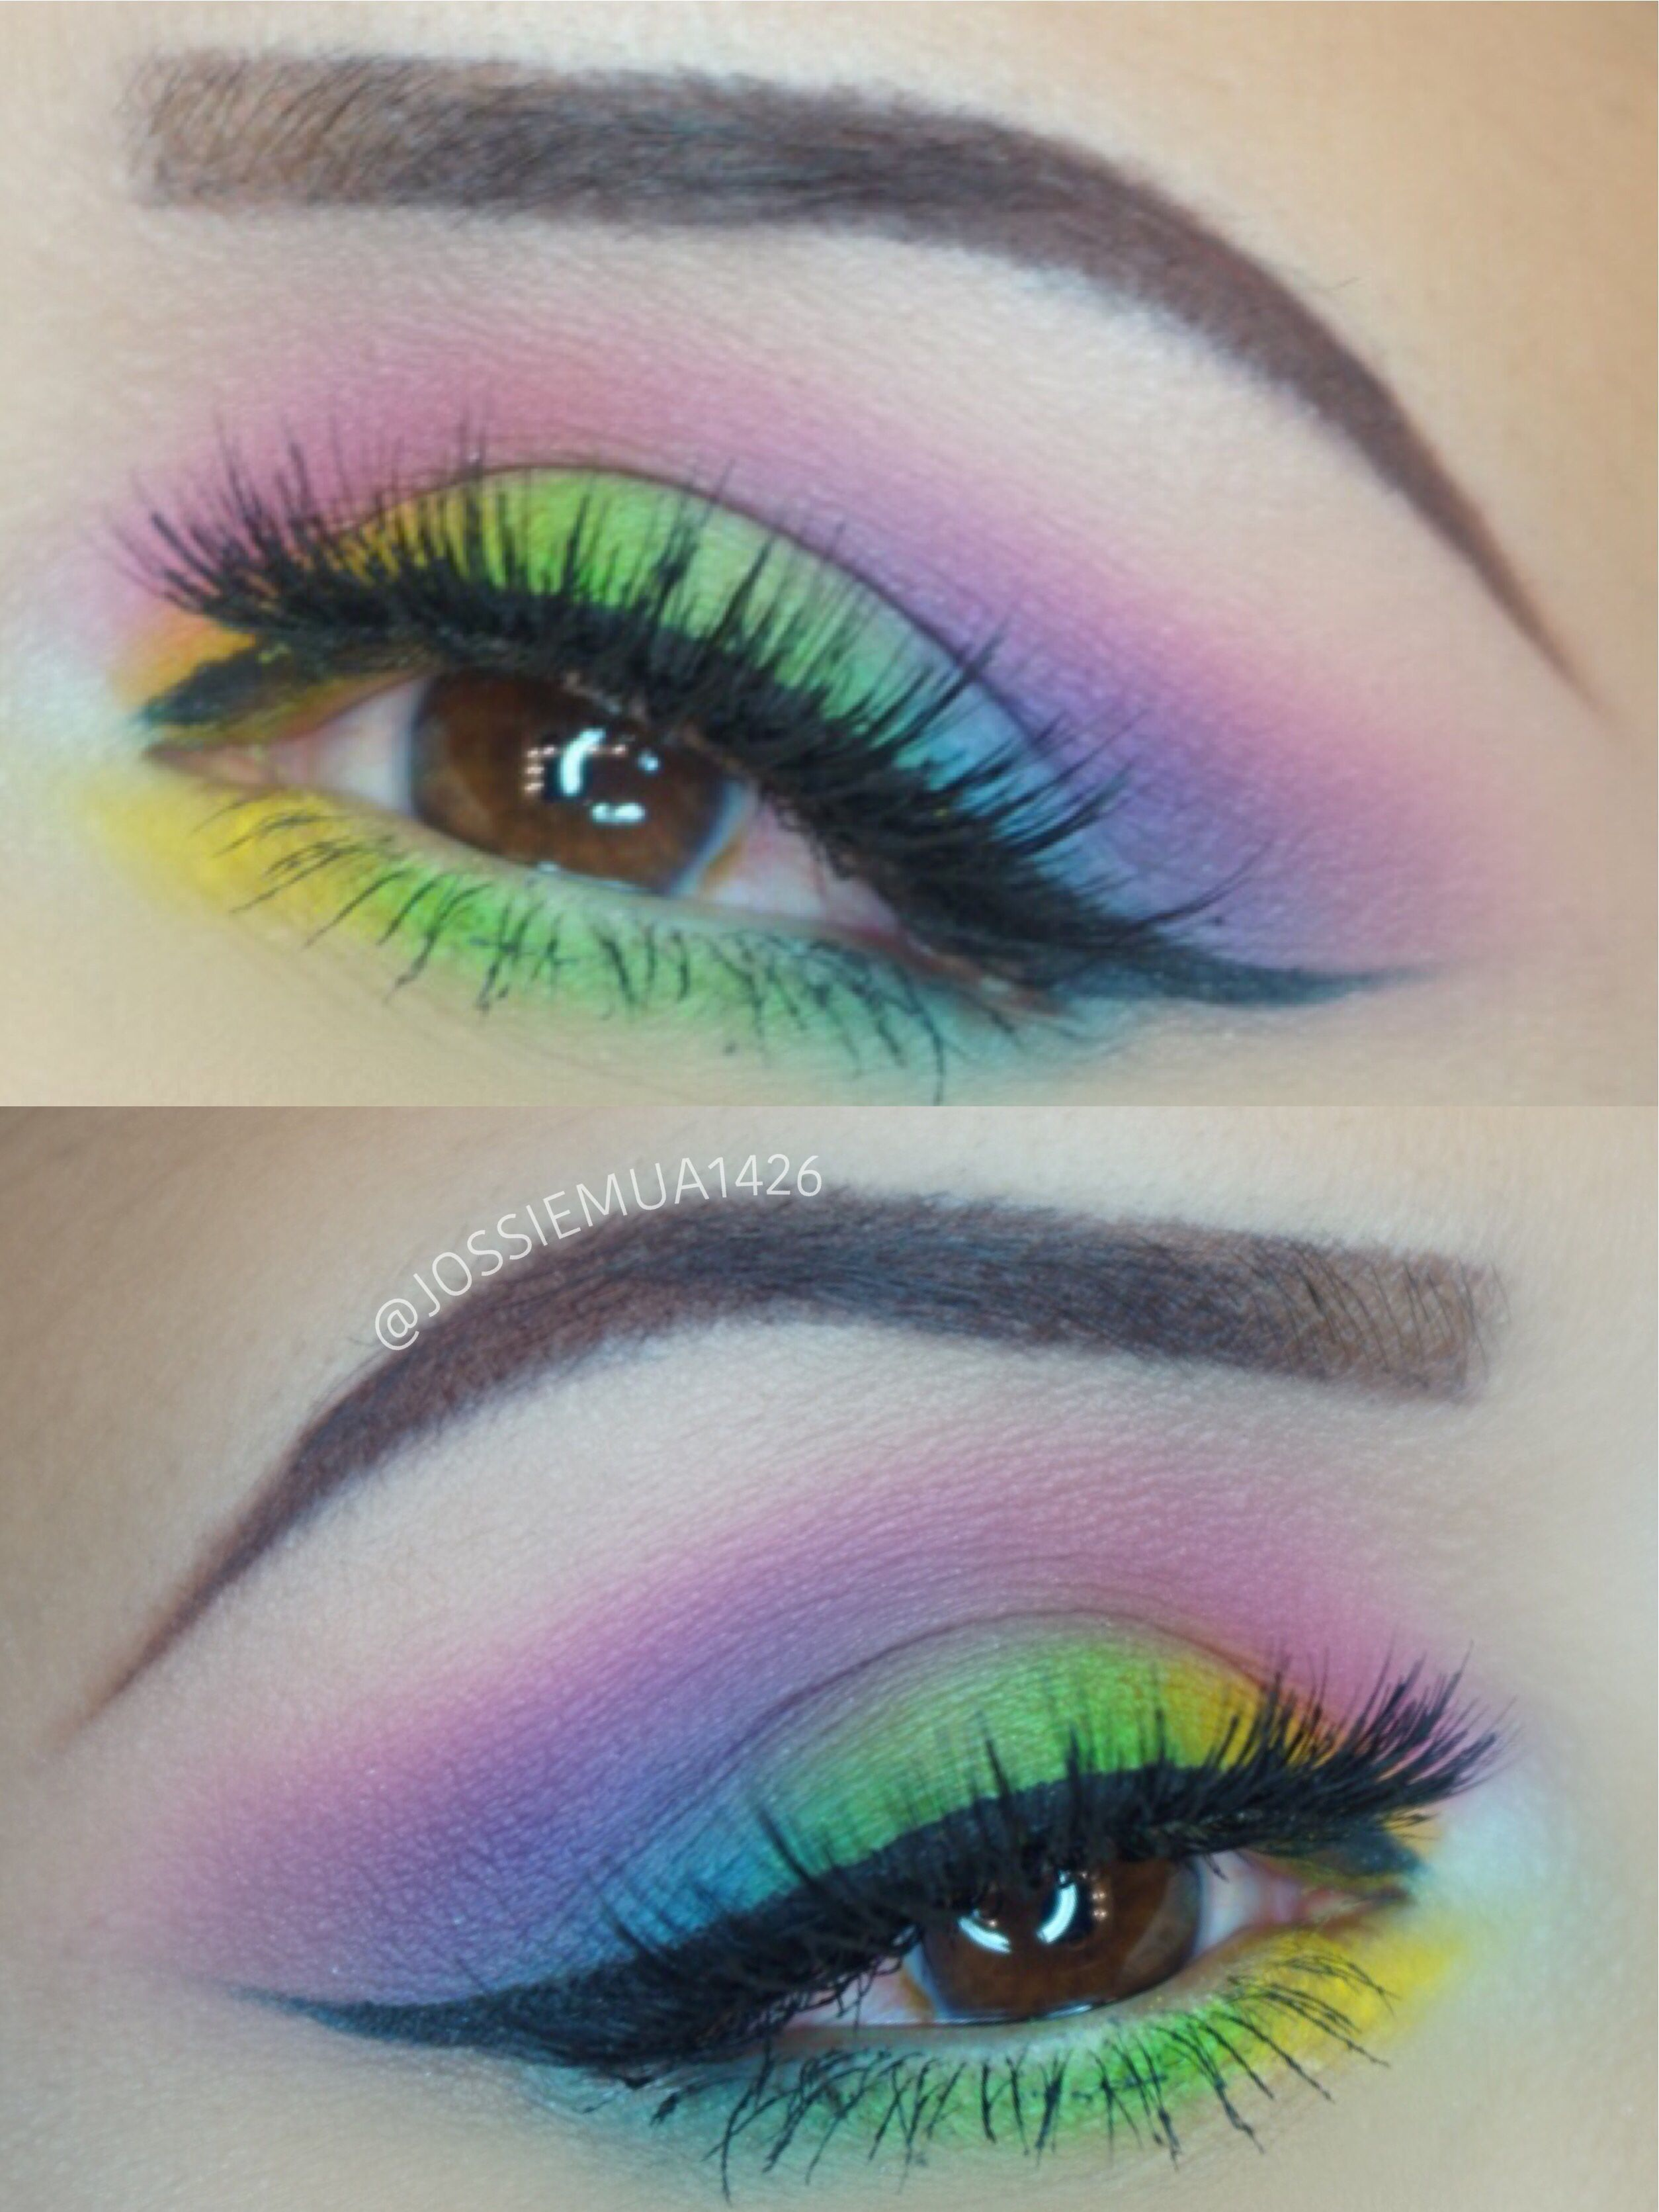 Bhcosmetics Take Me Back To Brazil Palette Rainbowlook Looks